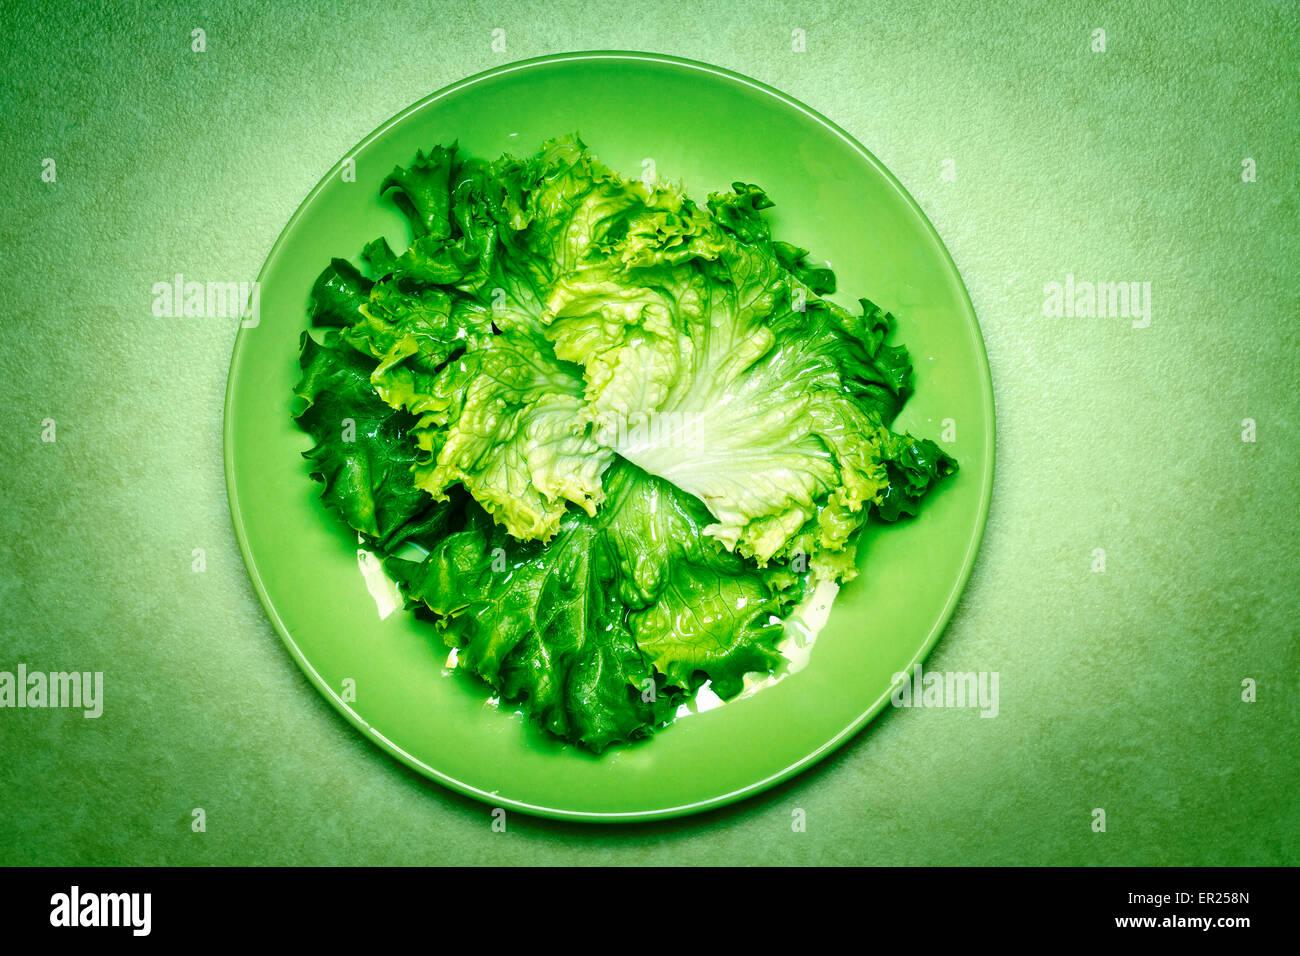 Salade verte feuilles sur plaque verte Photo Stock